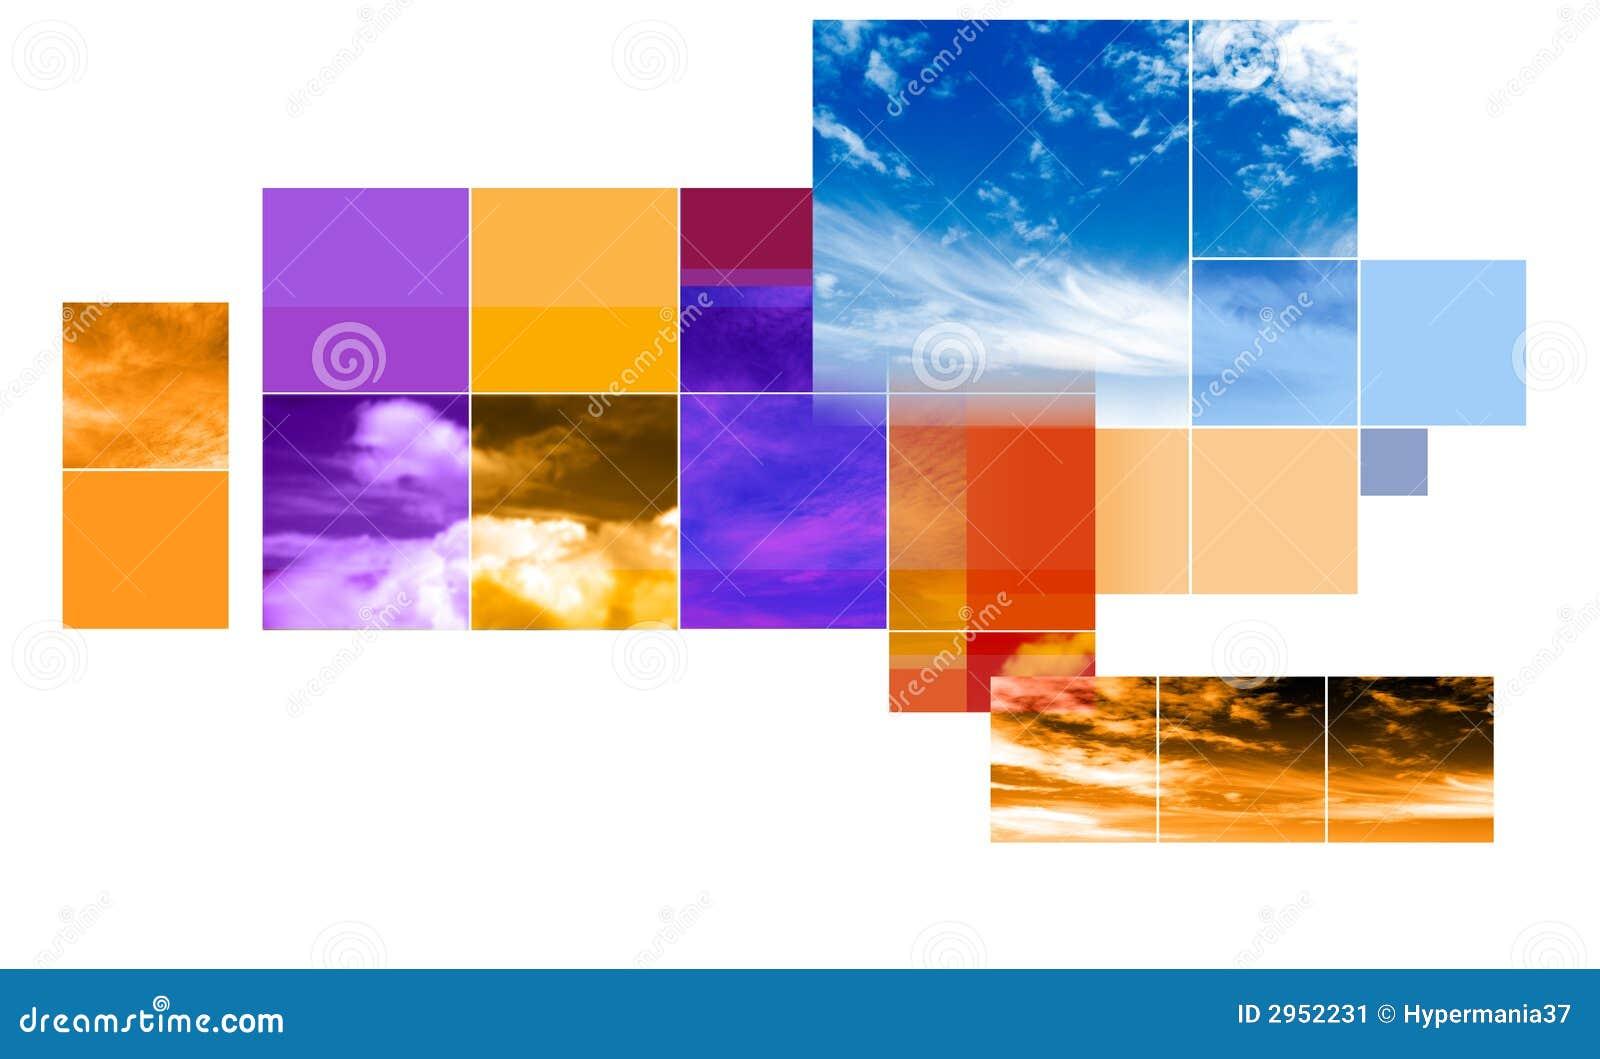 abstract montage design stock illustration illustration of